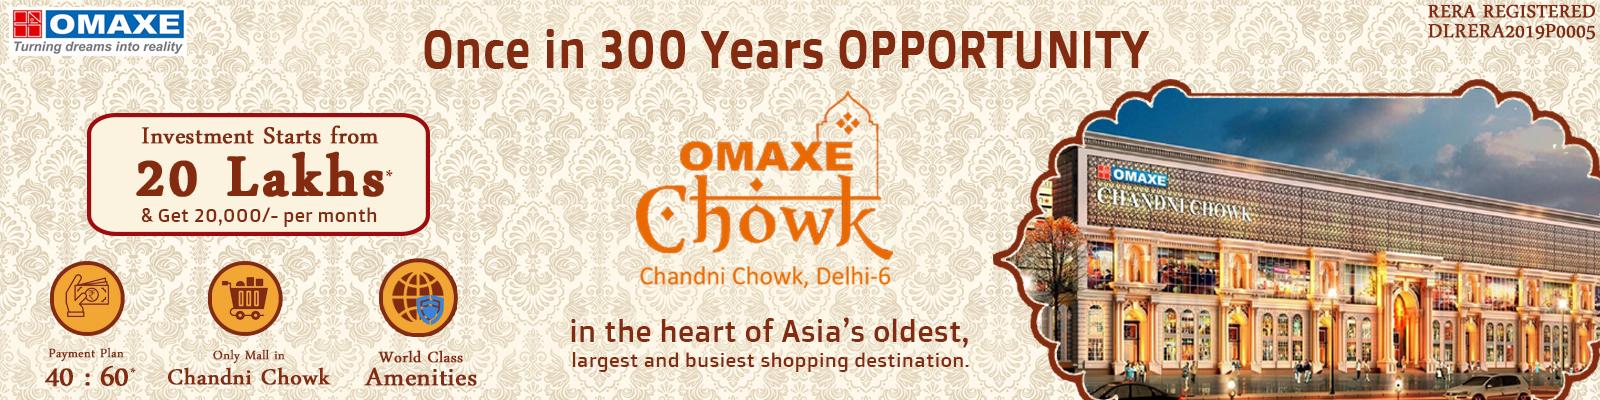 Omaxe Mall Chandni Chowk